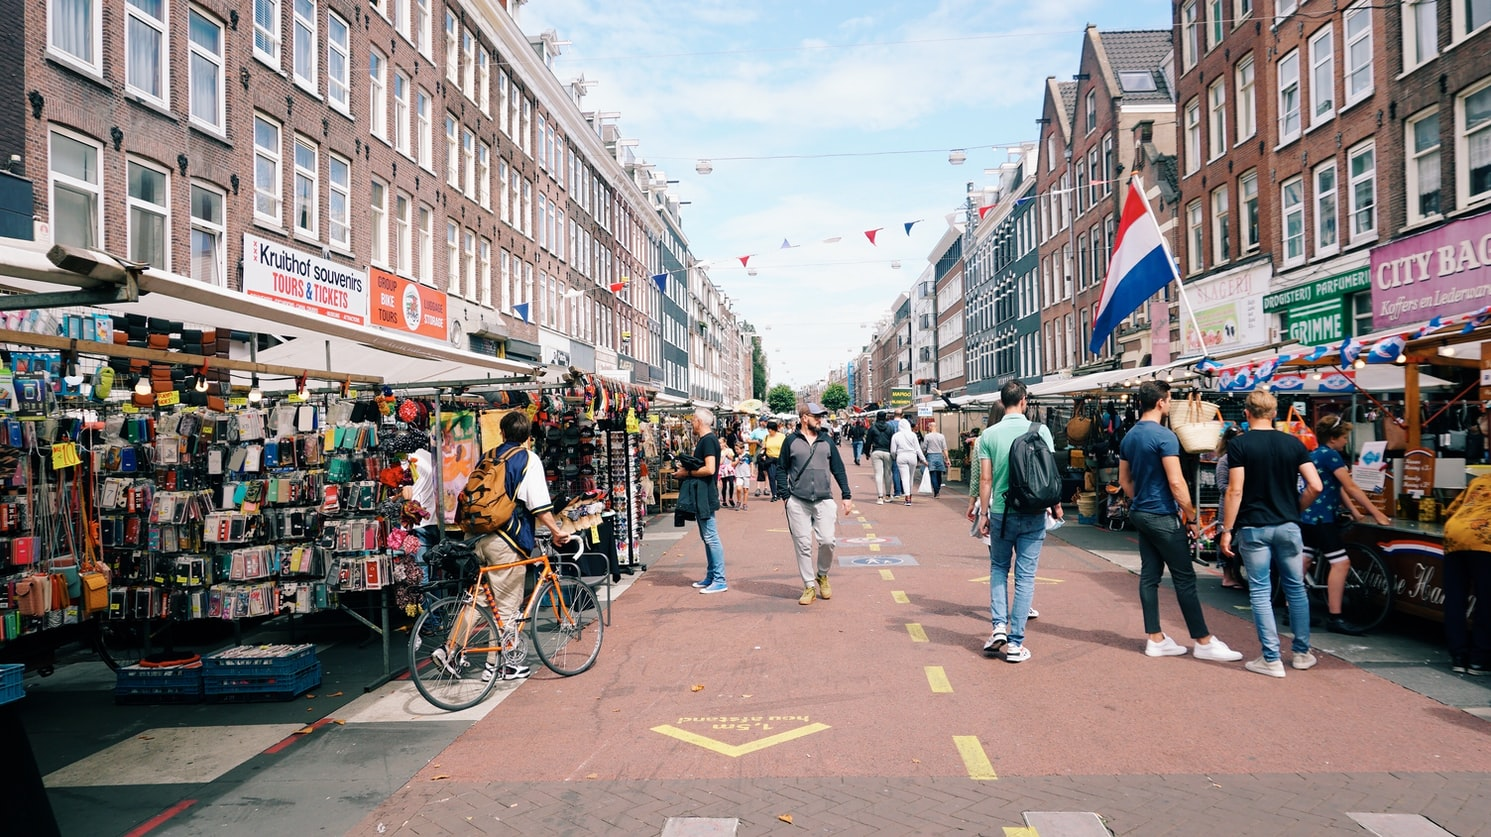 The Albert CUYP Market